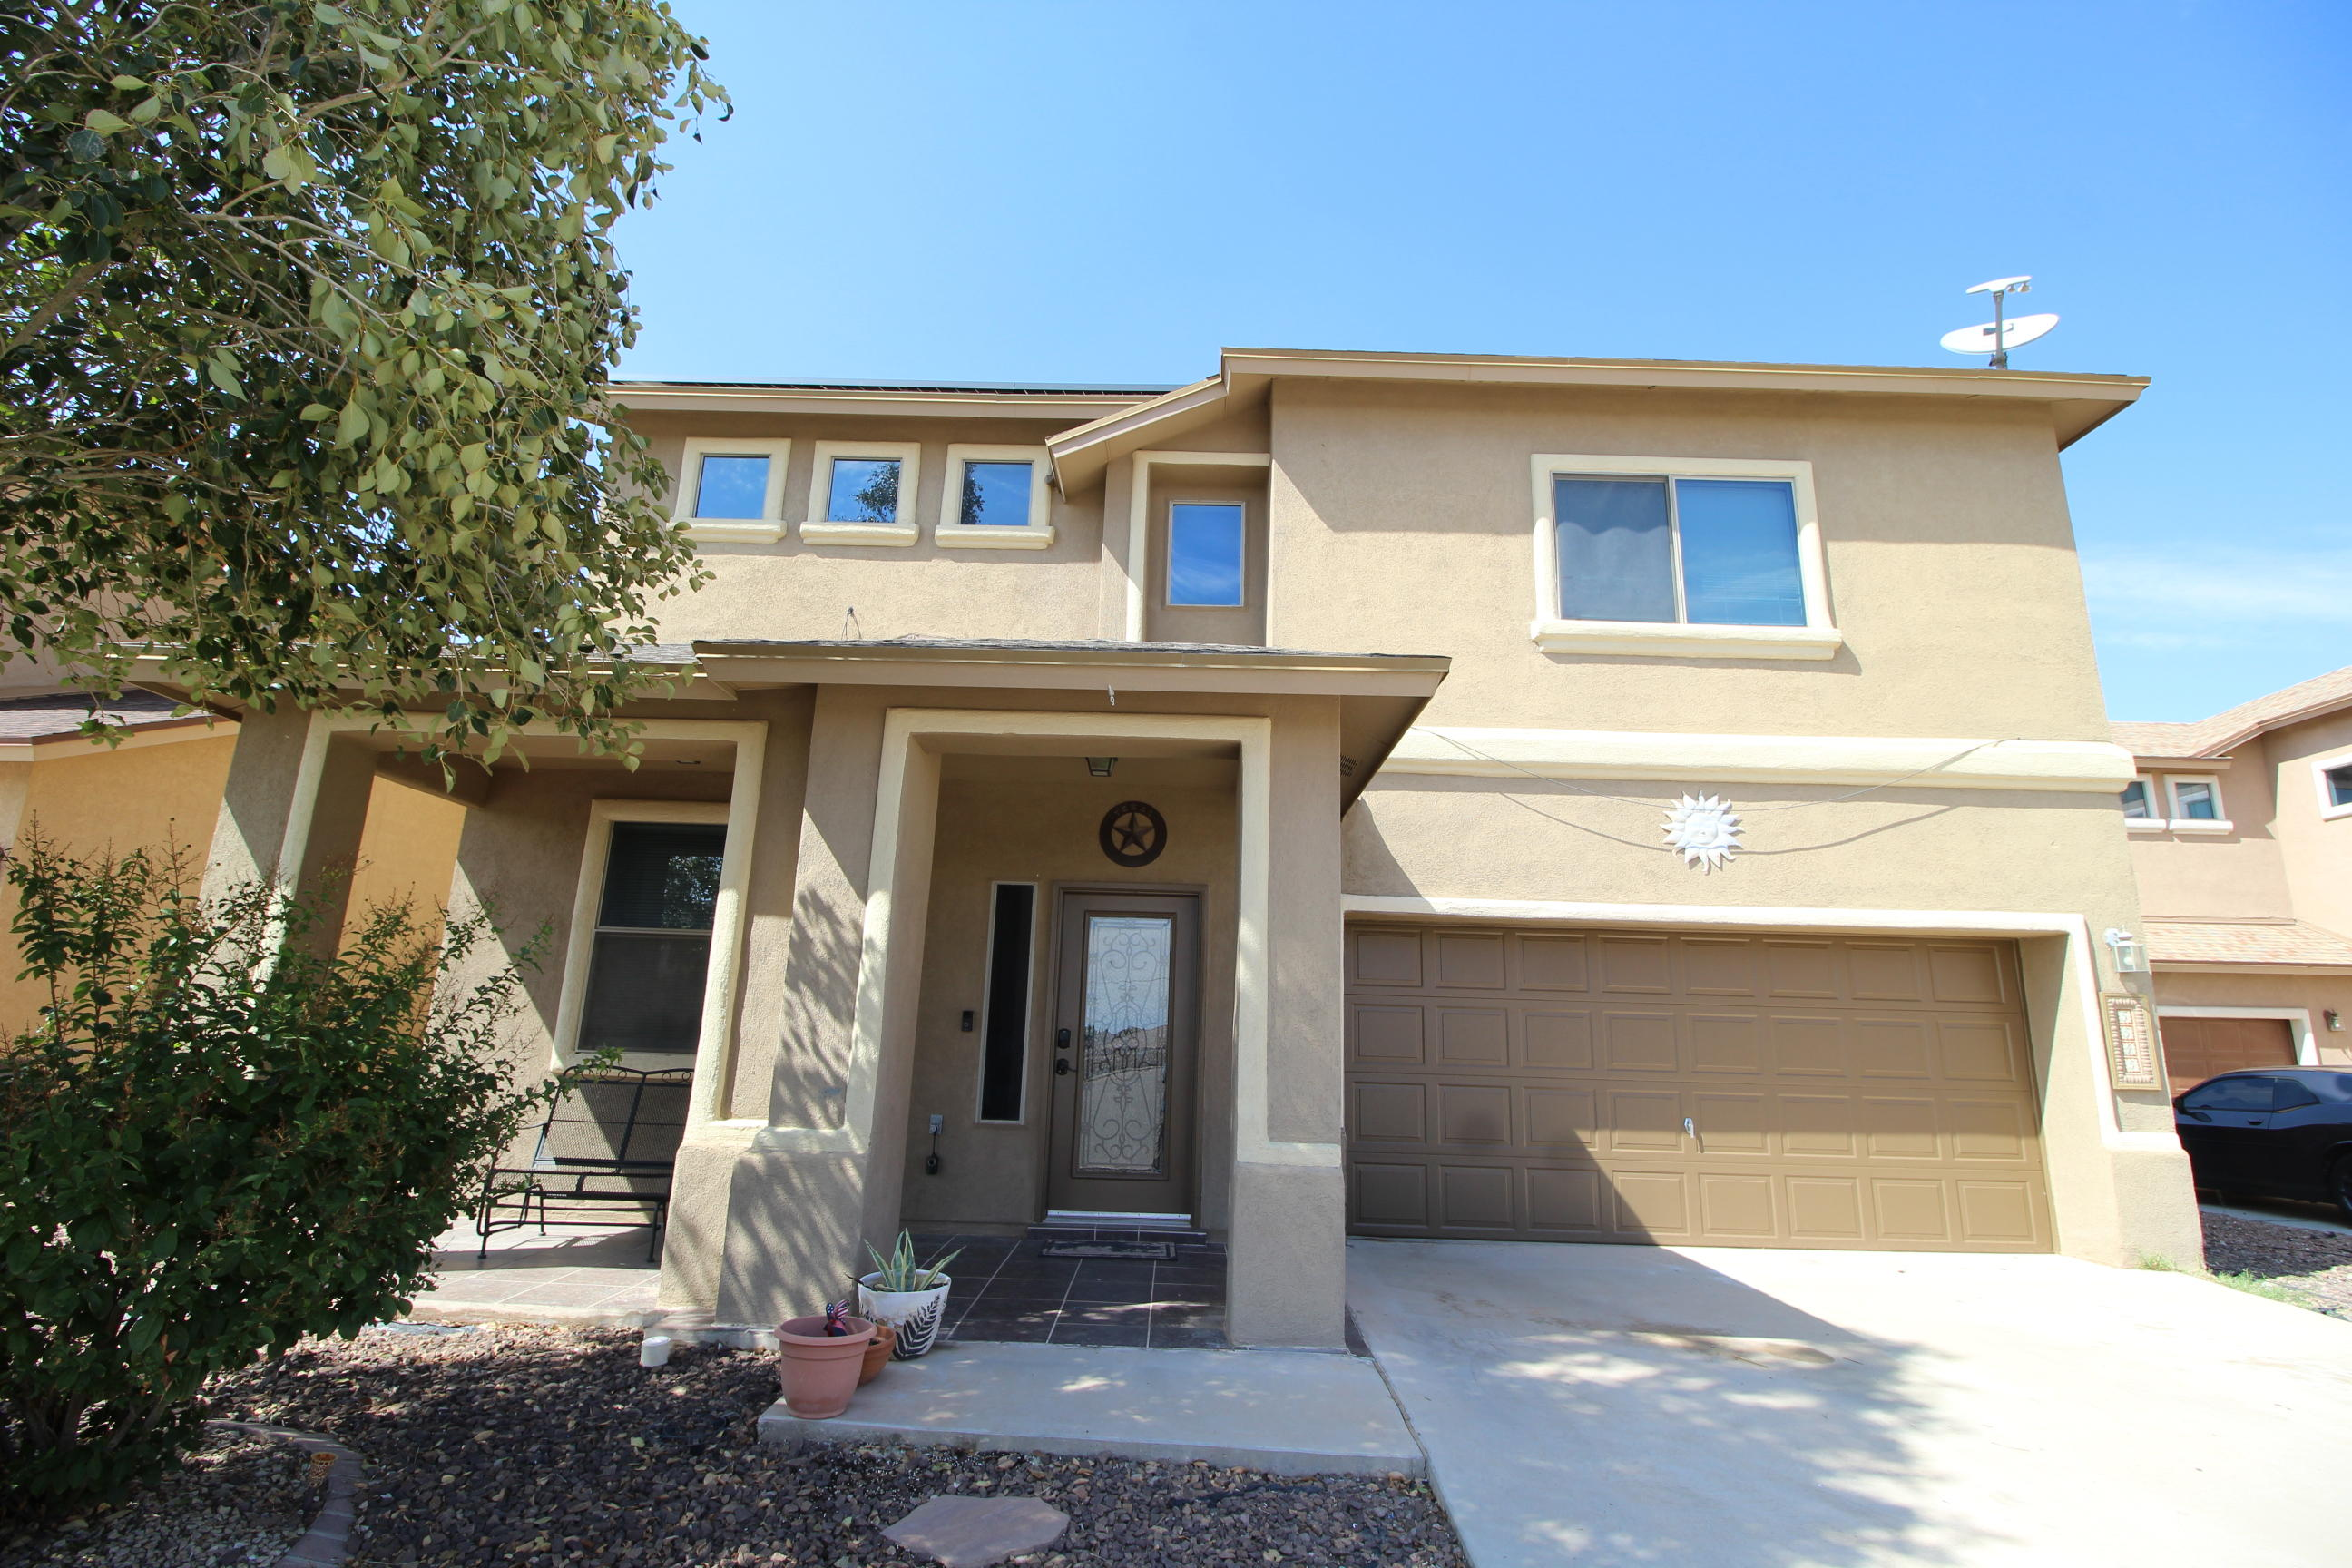 5545 JIM CASTANEDA, El Paso, Texas 79934, 4 Bedrooms Bedrooms, ,3 BathroomsBathrooms,Residential,For sale,JIM CASTANEDA,816512